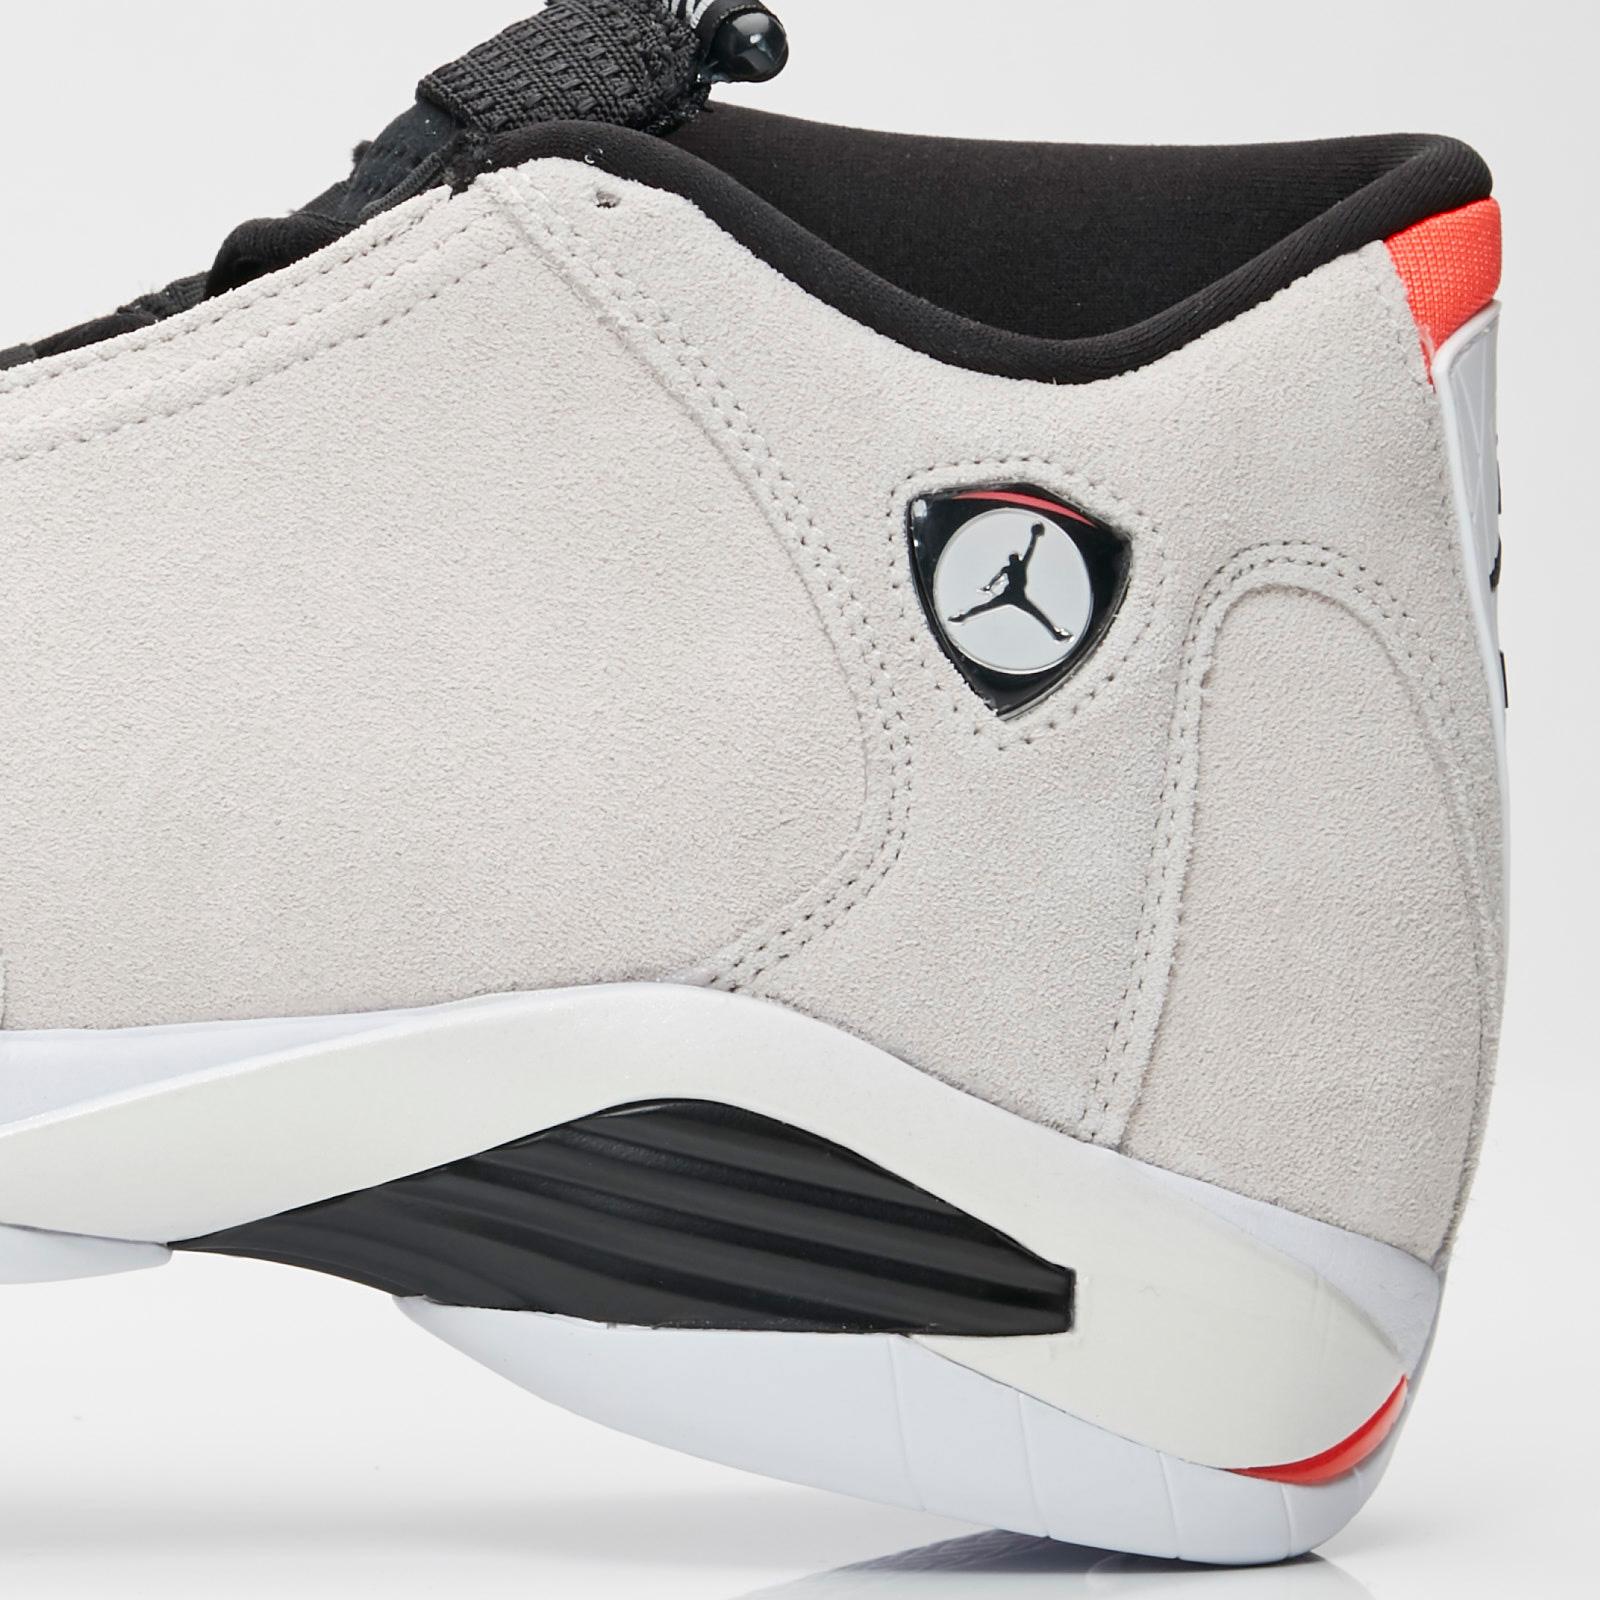 2da0d7813bb2d4 Jordan Brand Air Jordan 14 Retro - 487471-021 - Sneakersnstuff ...